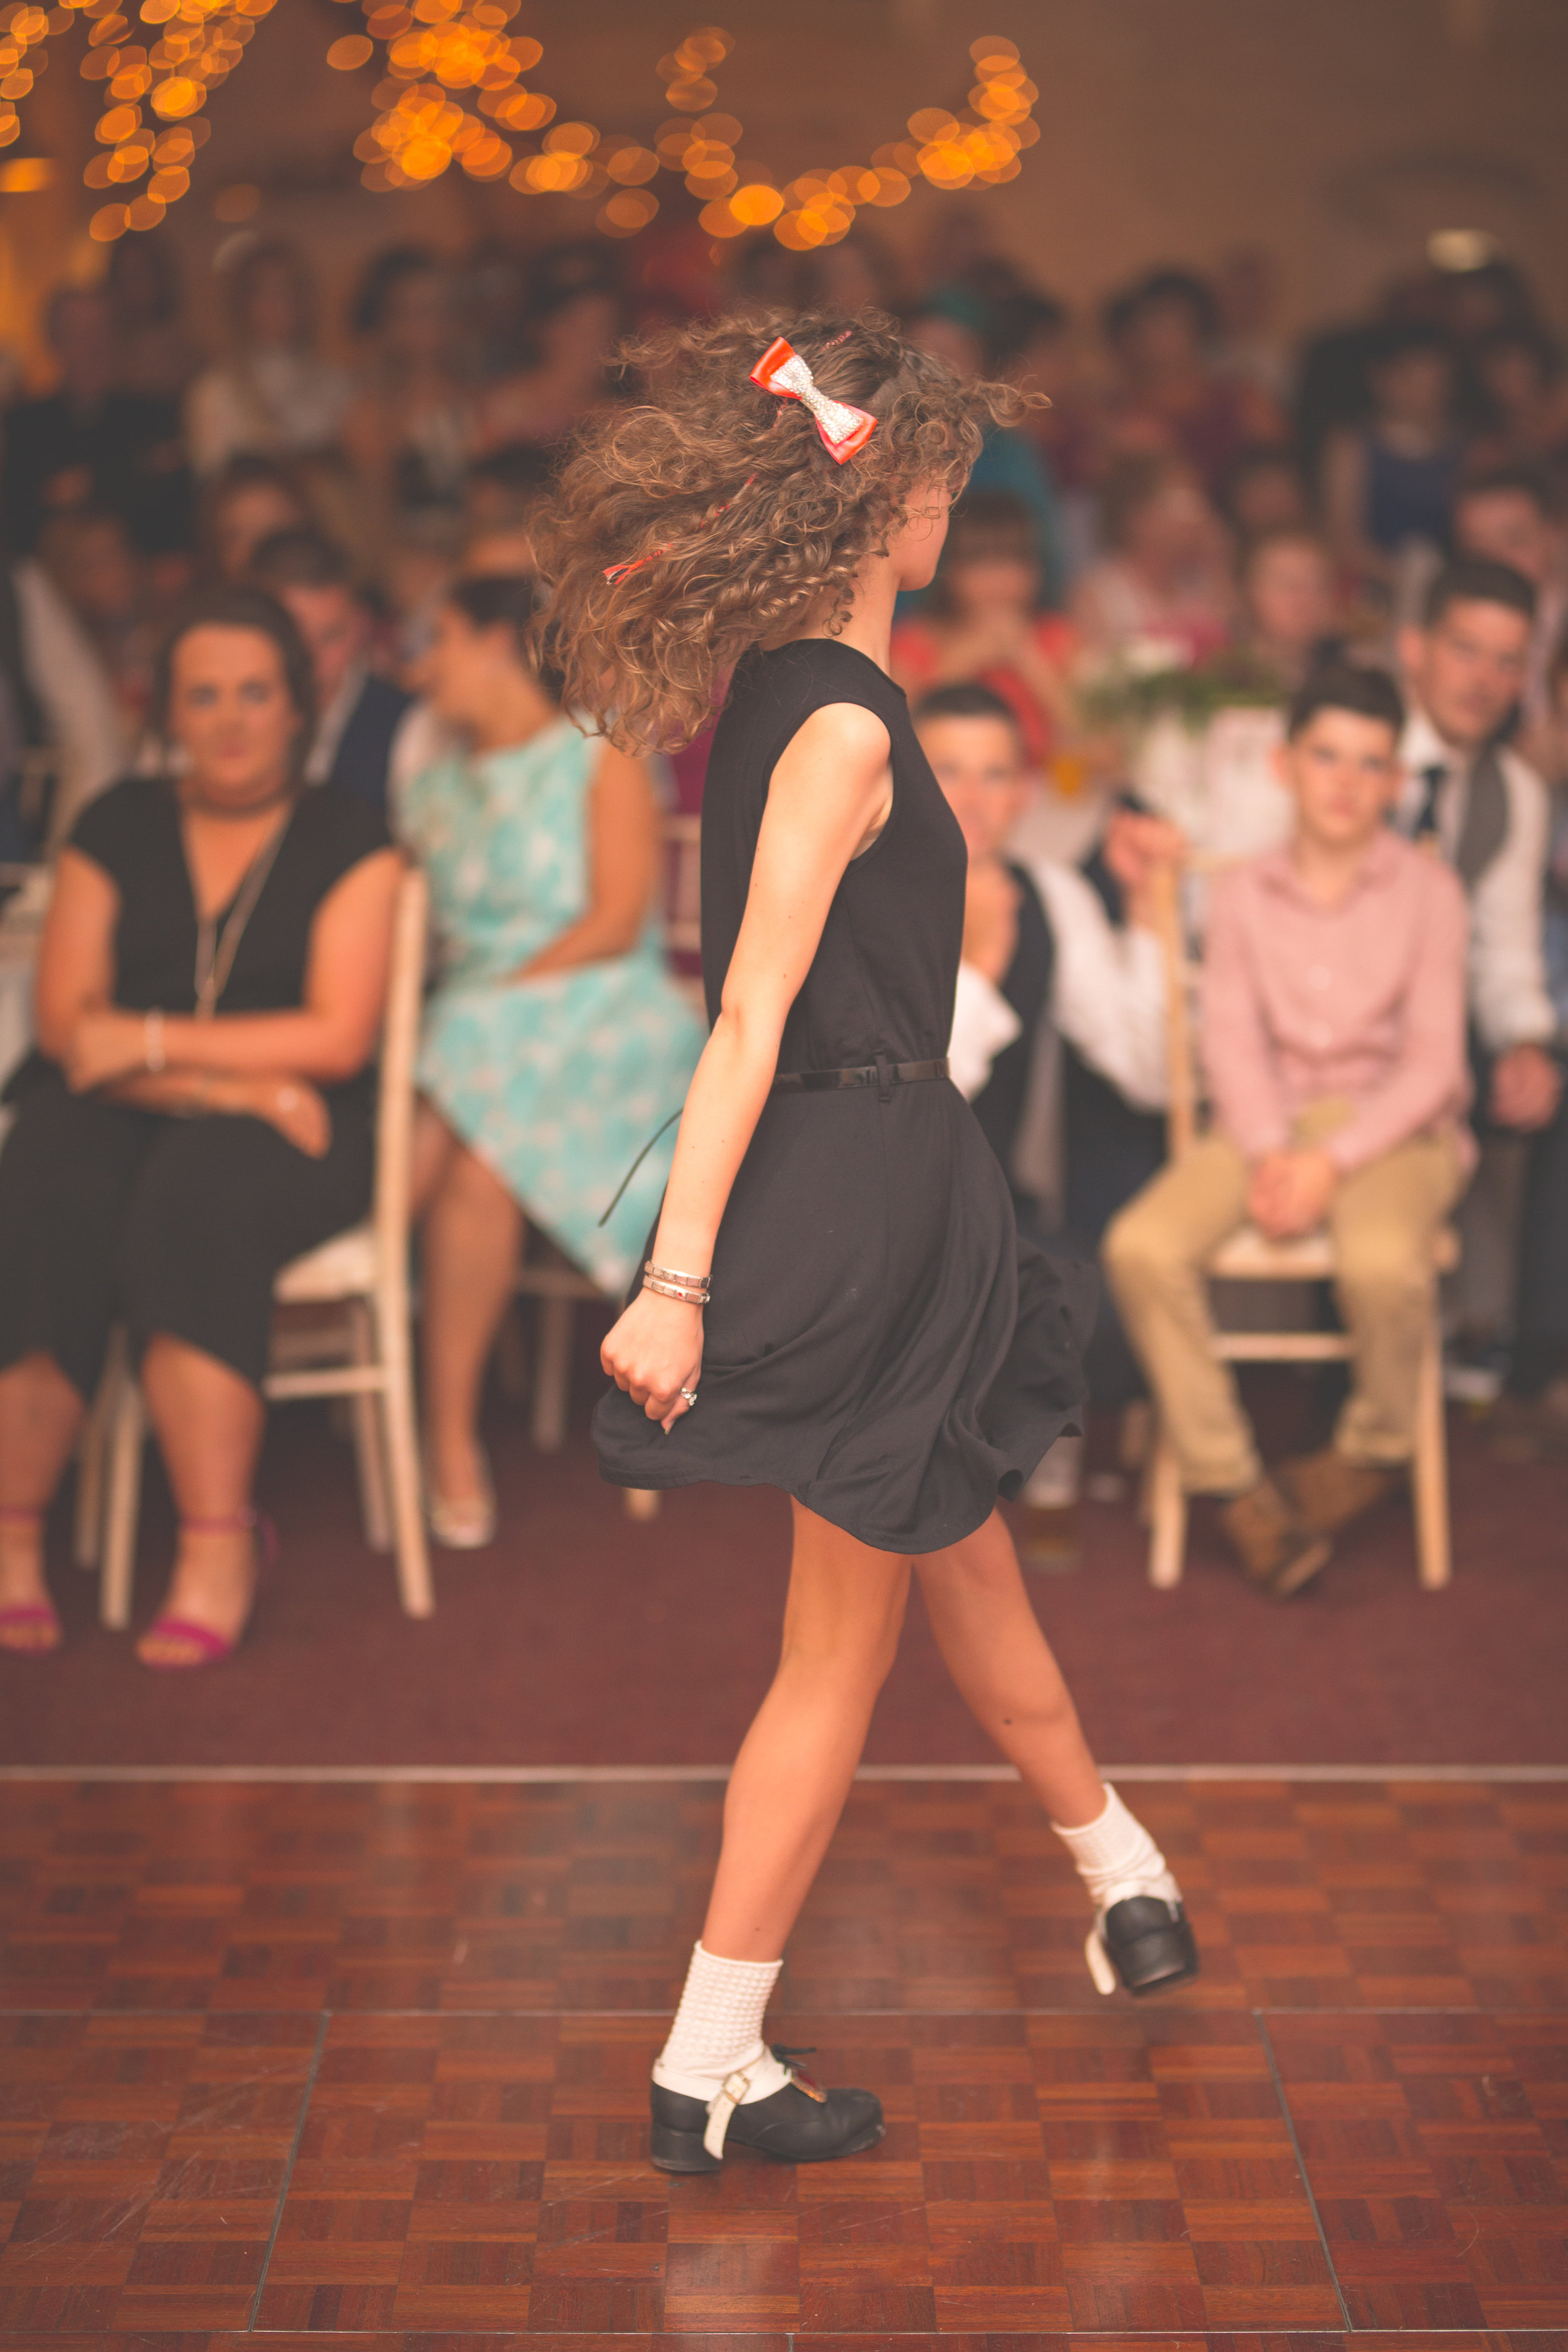 Brian McEwan Wedding Photography | Carol-Annee & Sean | The Dancing-10.jpg